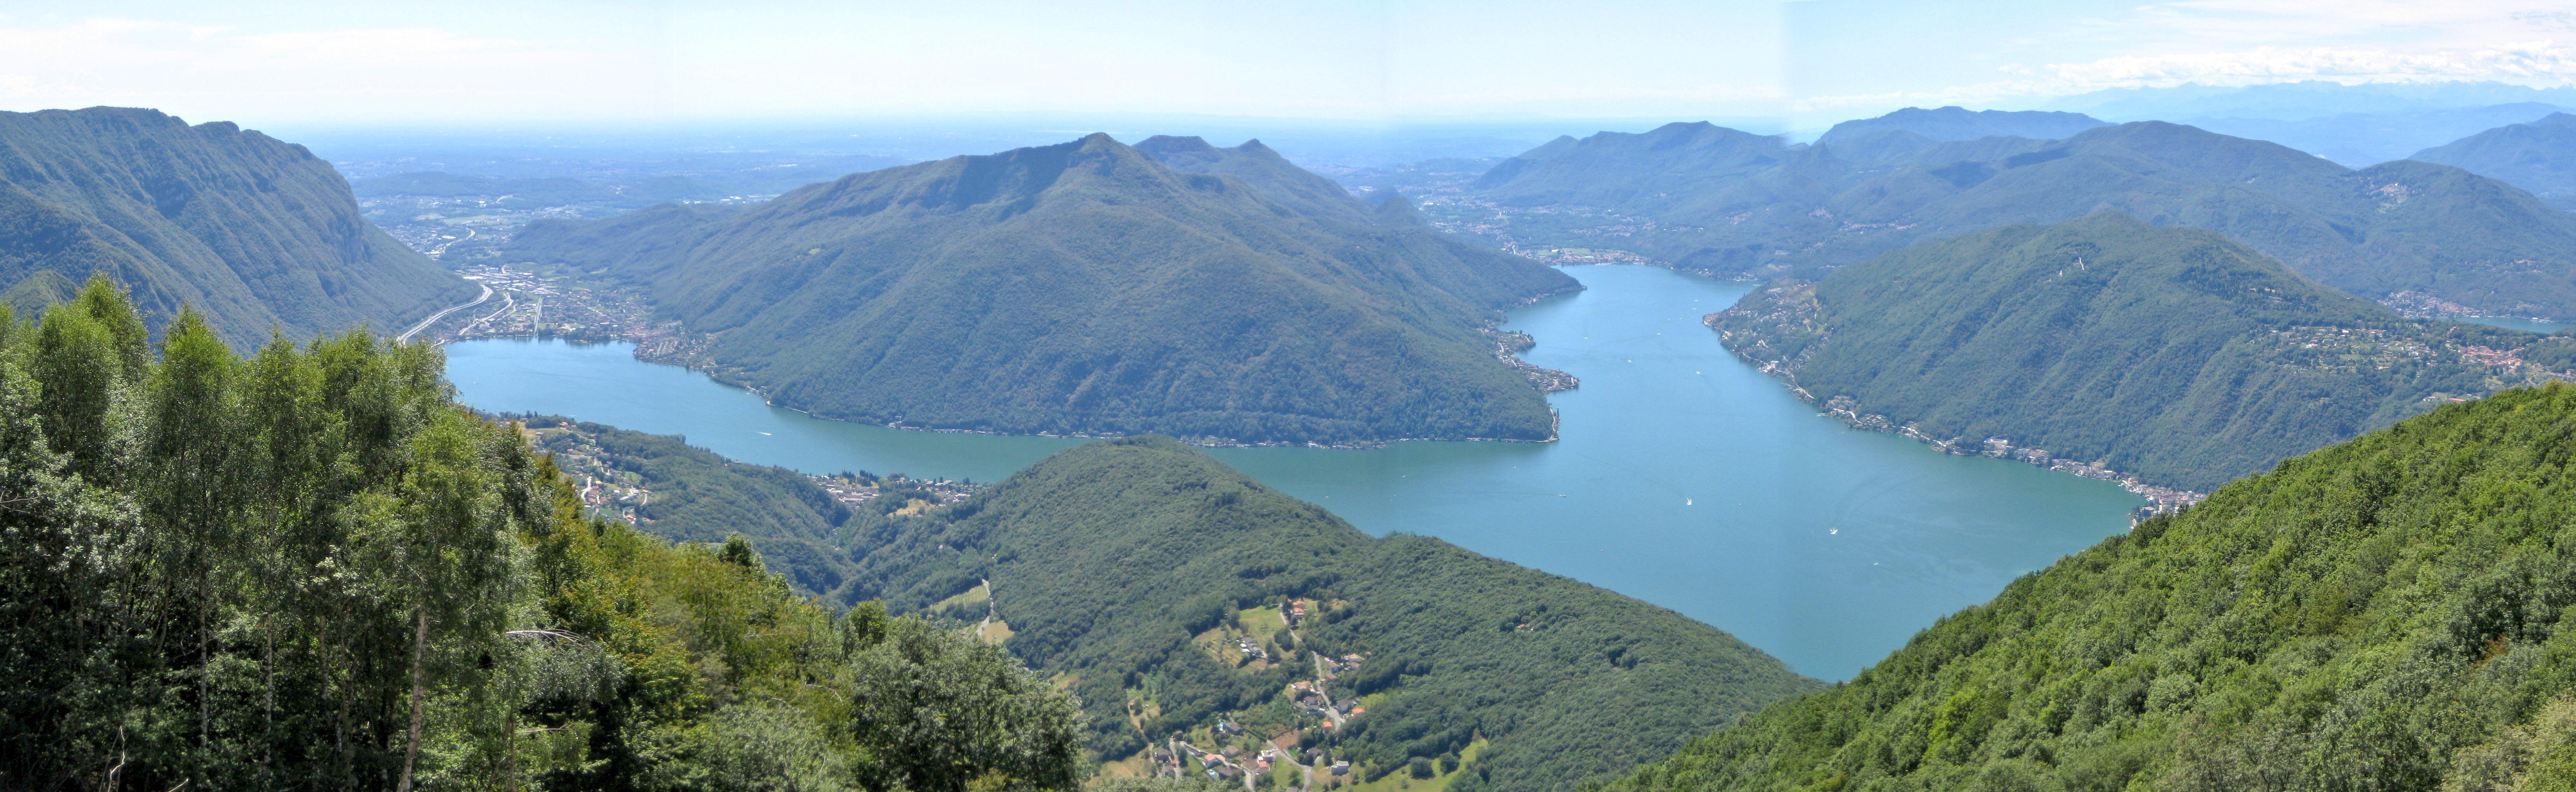 Lago_di_Lugano_Panorama